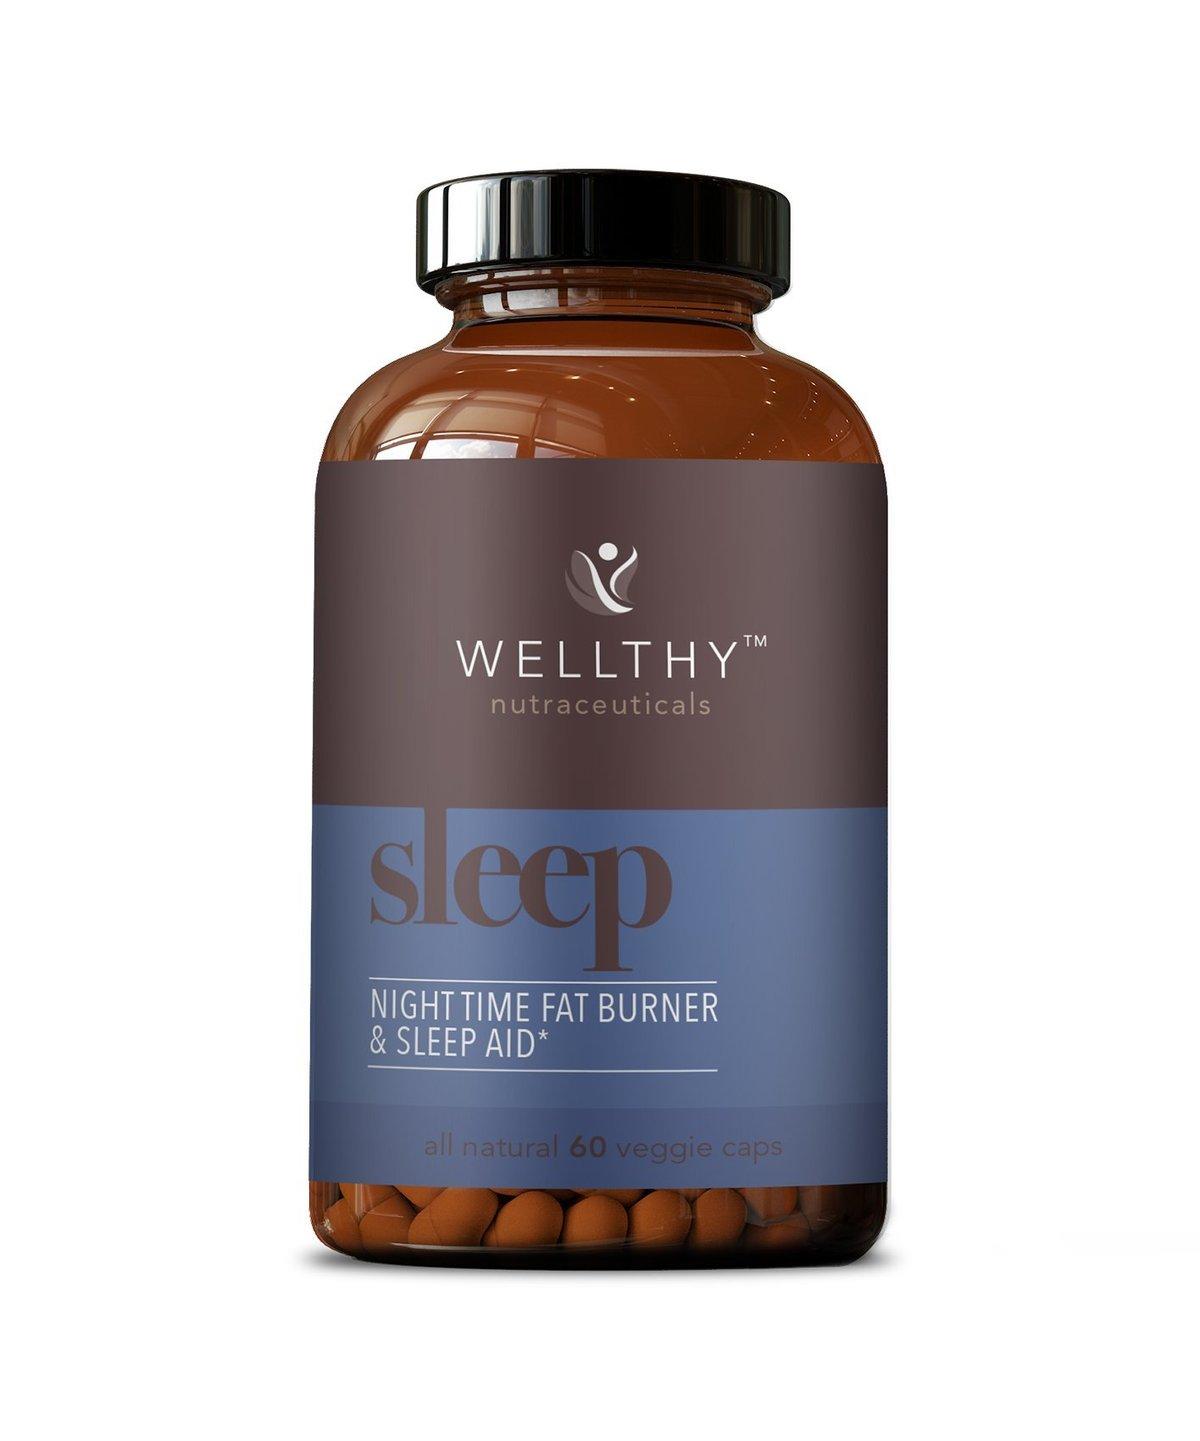 Wellthy | SLEEP: Nighttime Fat Burner & Natural Sleep Aid